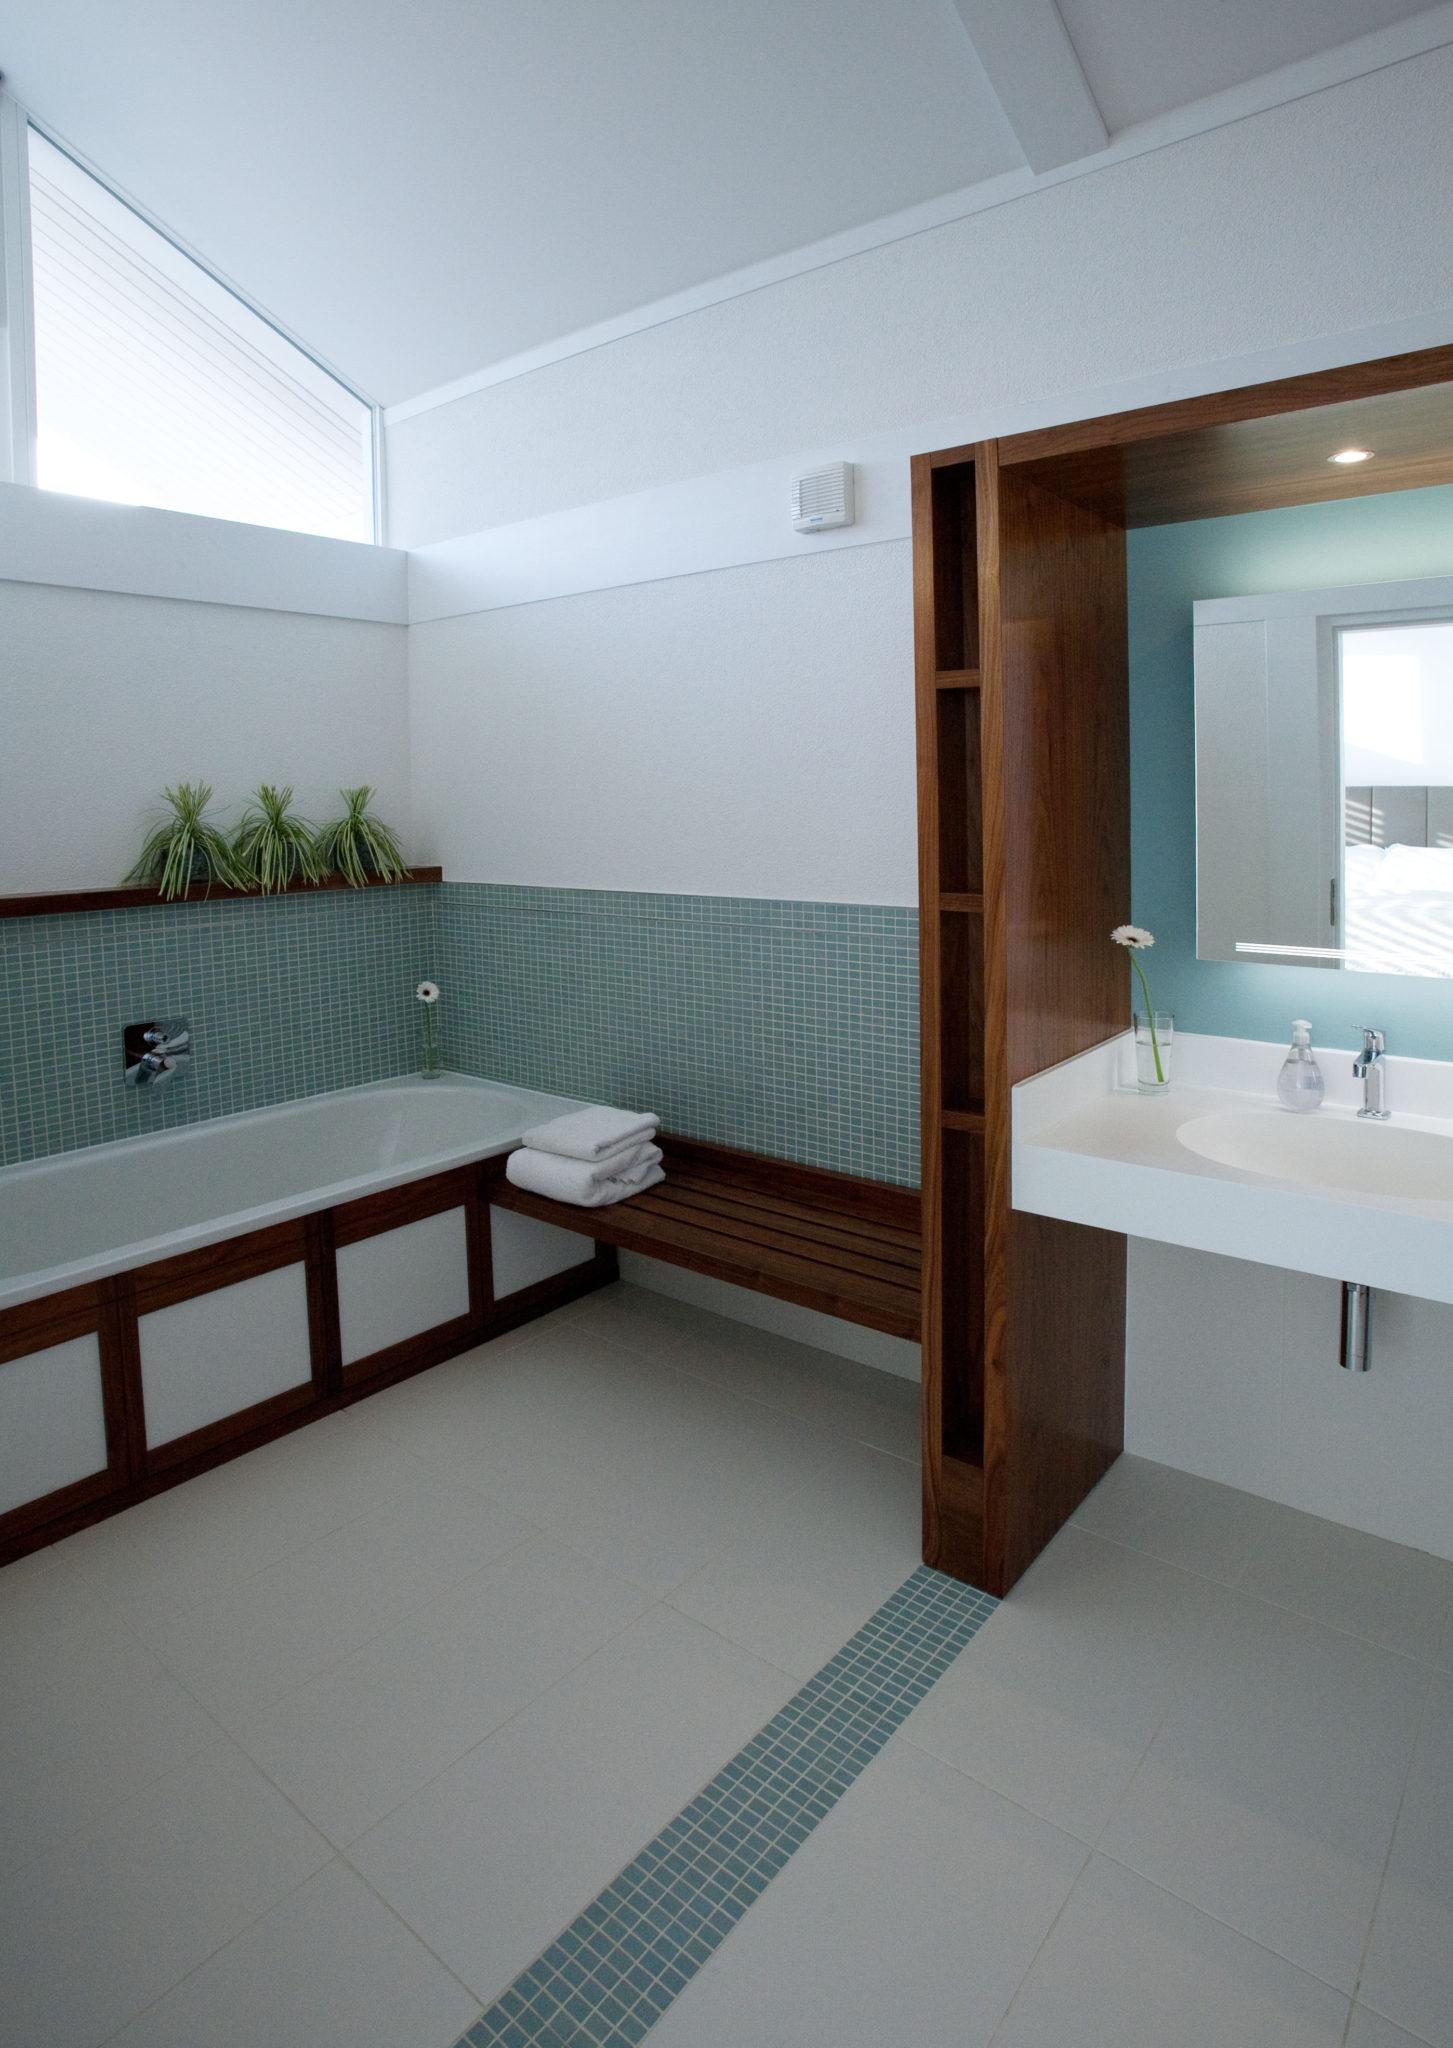 Exterior: Residential Interior Design For A Huf Haus In Surrey